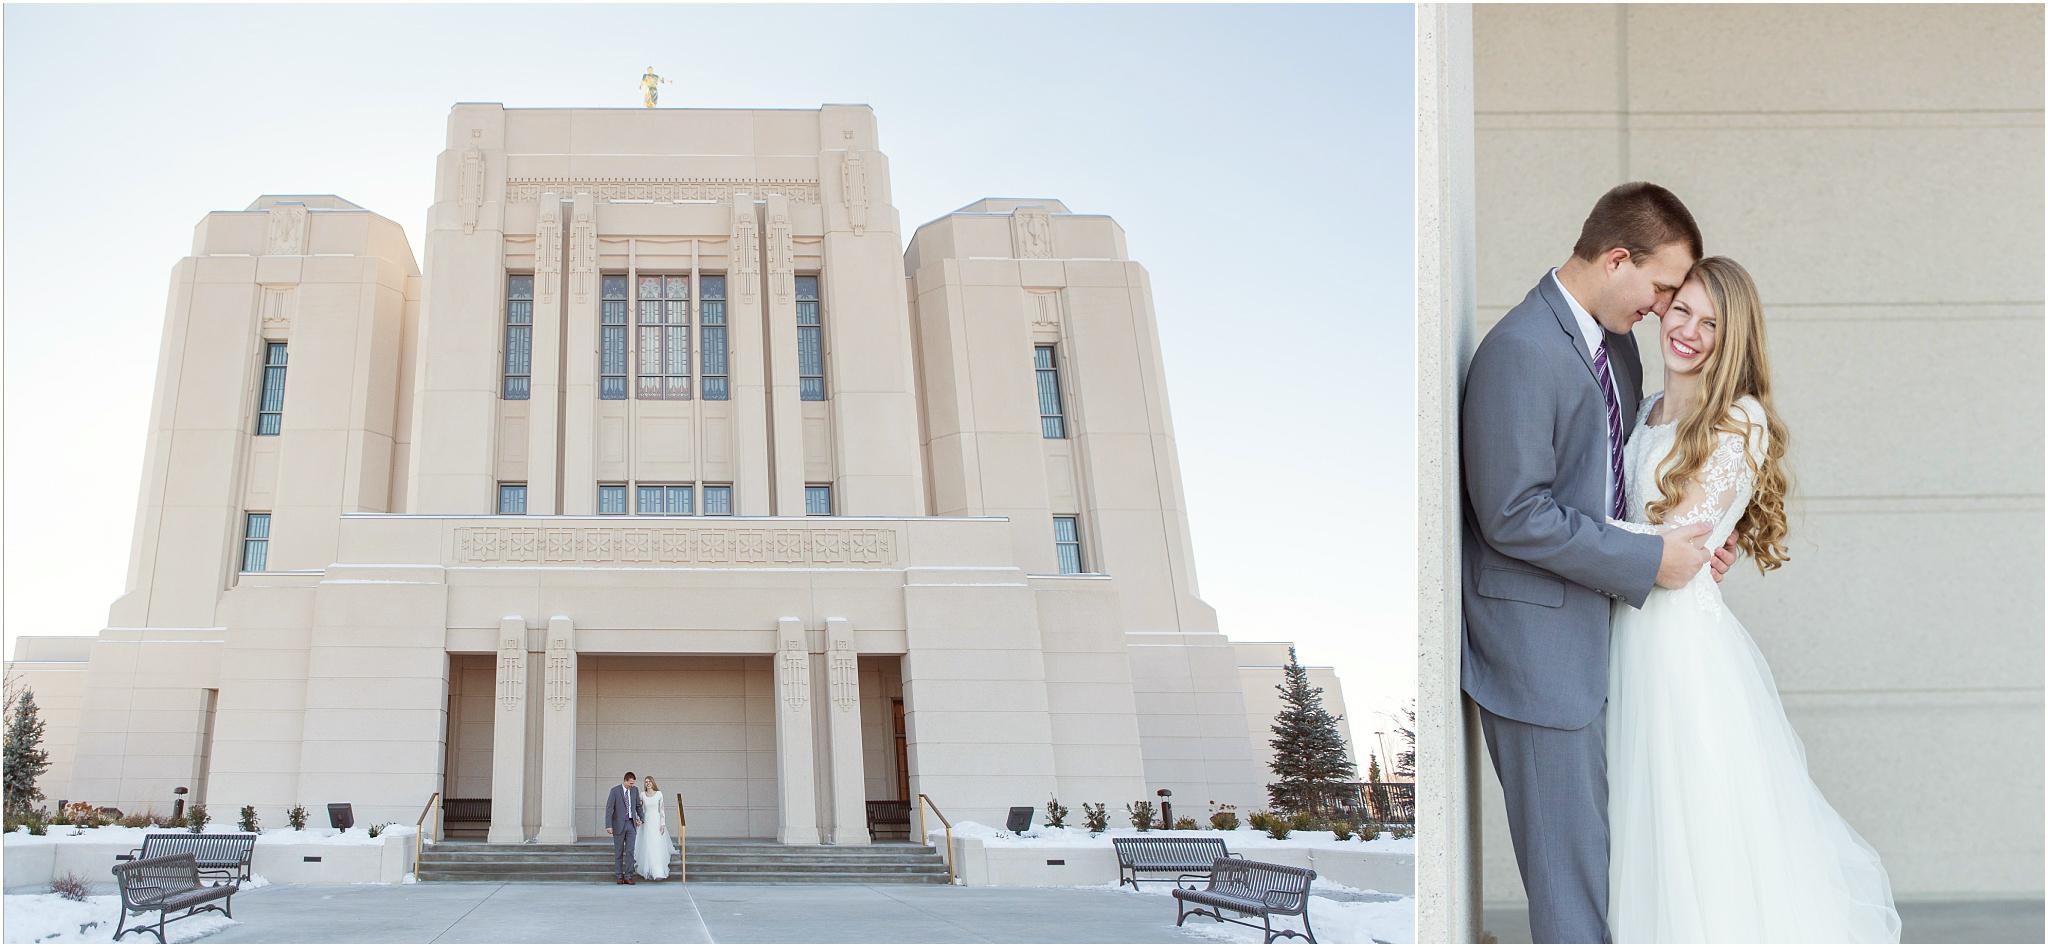 Wedding Photography_Meridian Idaho Temple_Boise Idaho_Leah Southwick Photography_0006.jpg